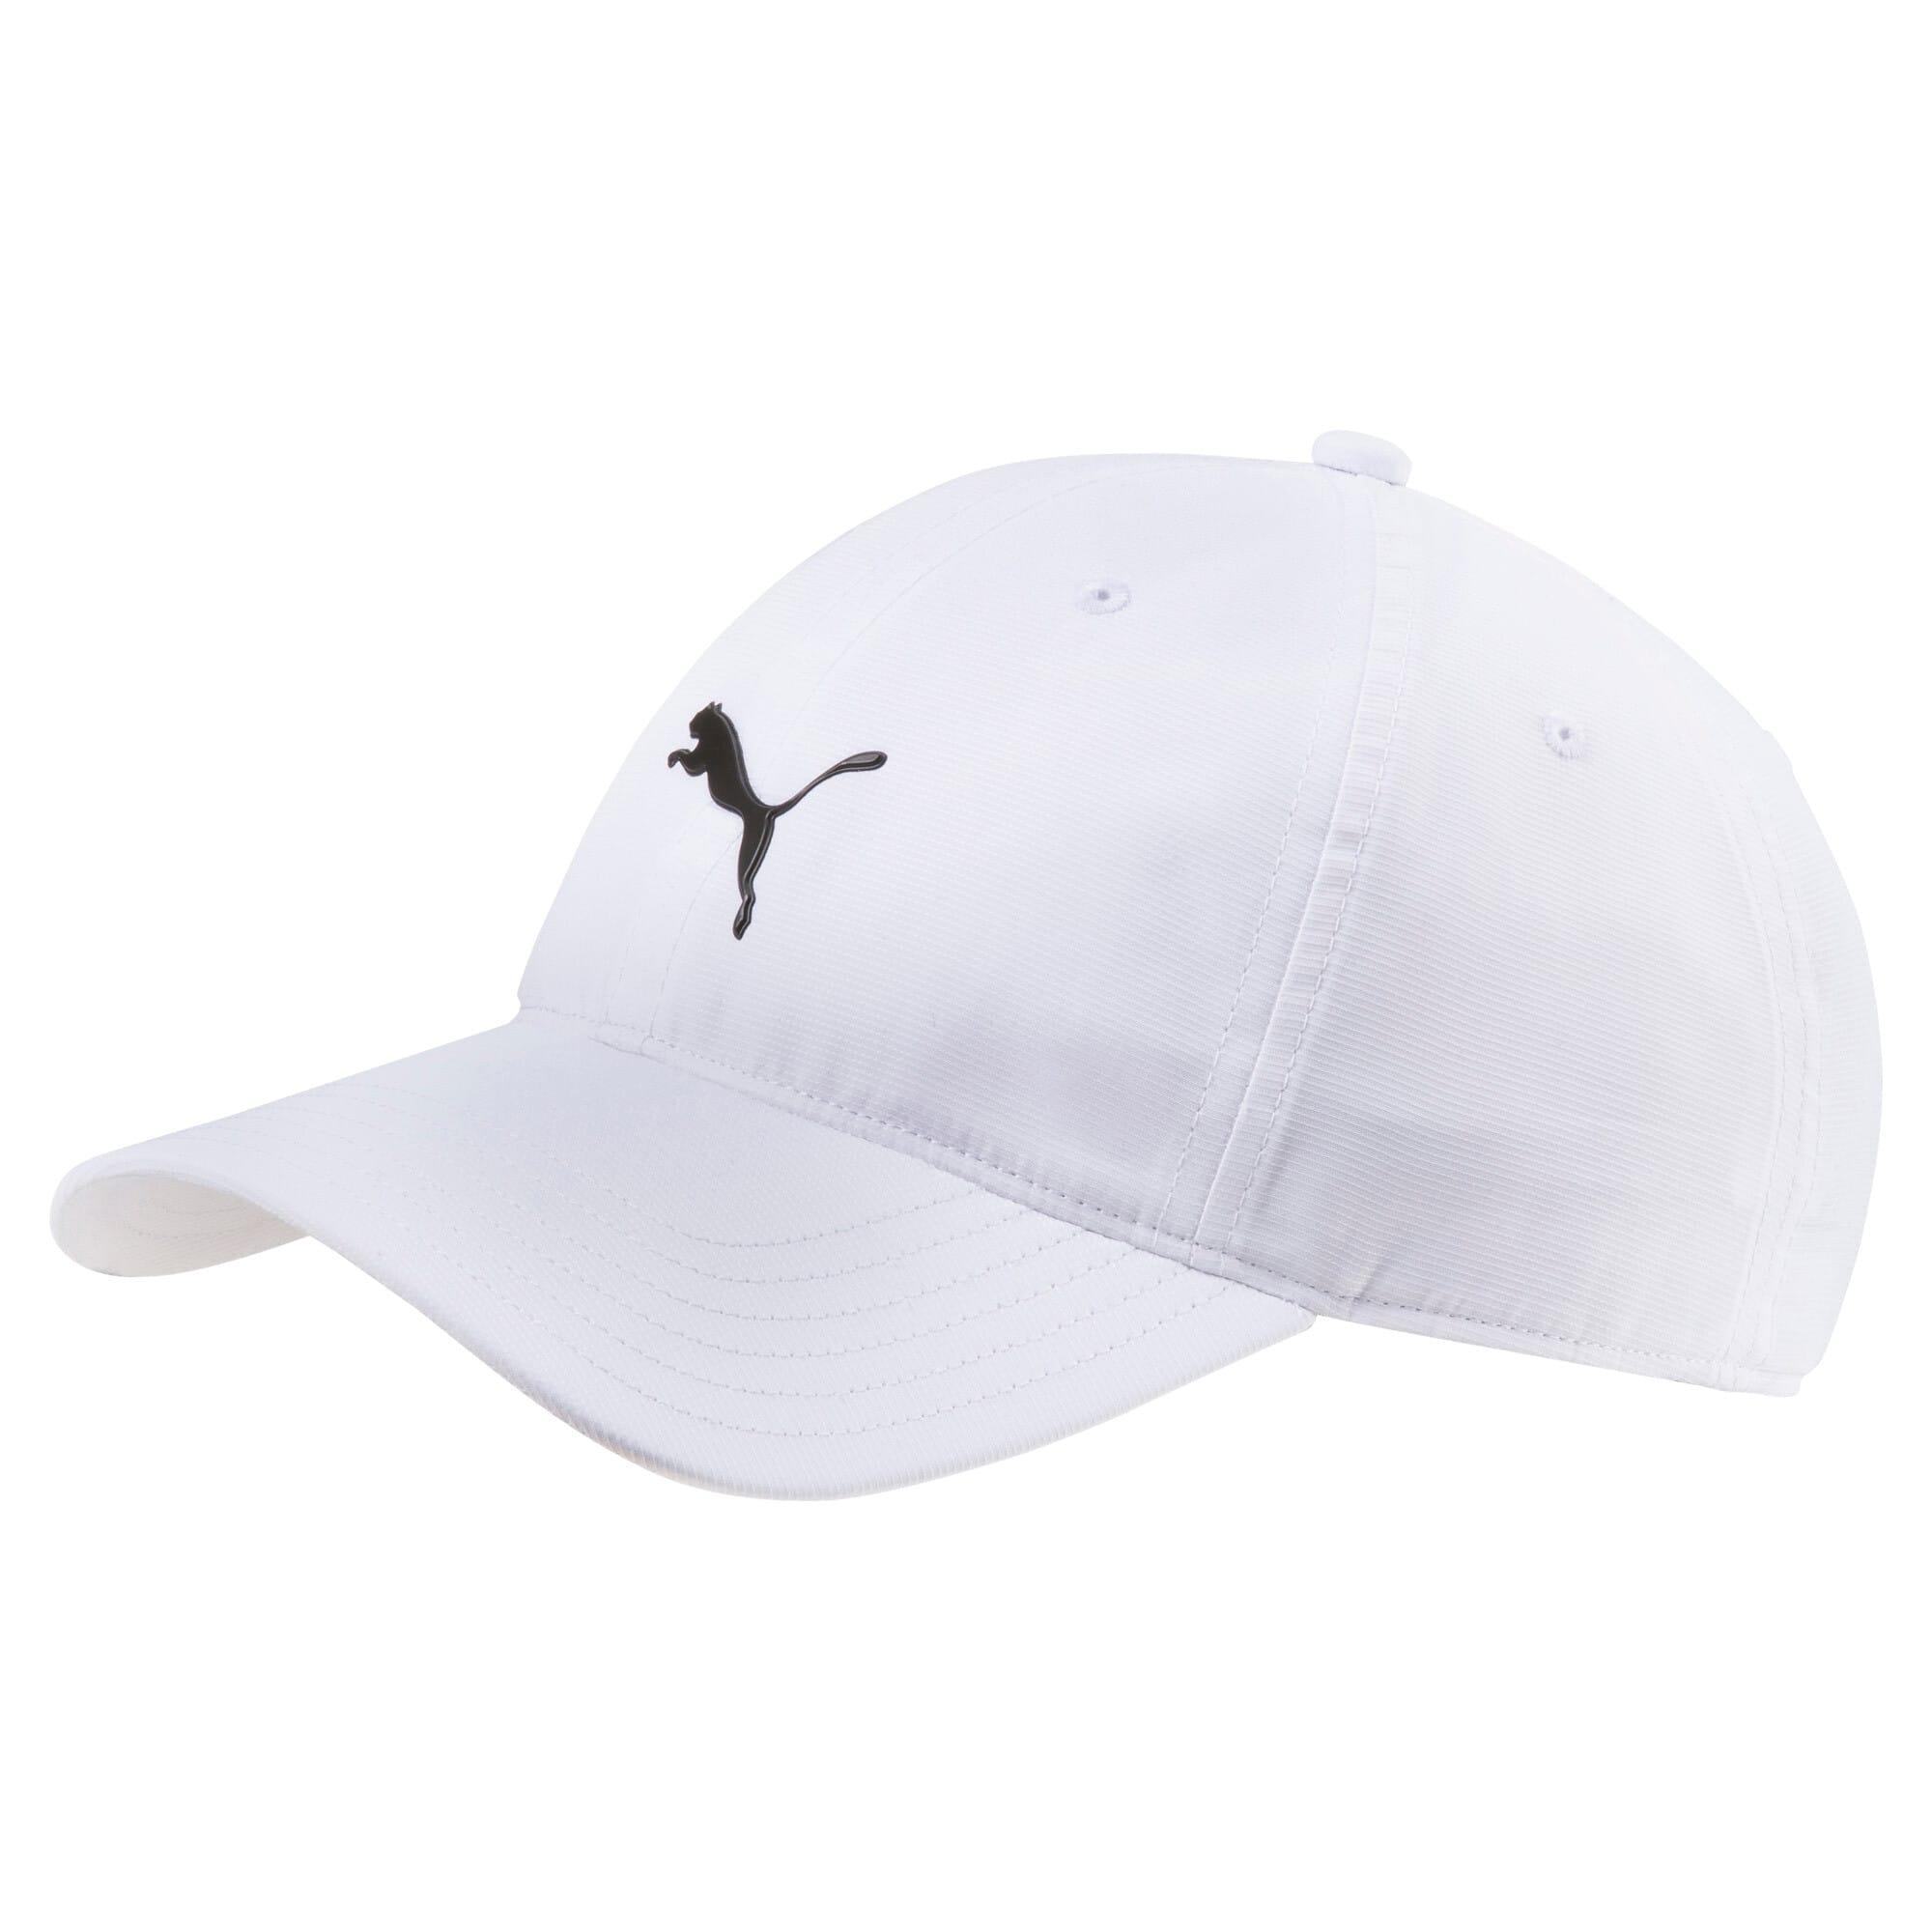 Thumbnail 1 of Golf Men's Pounce Adjustable Cap, Bright White, medium